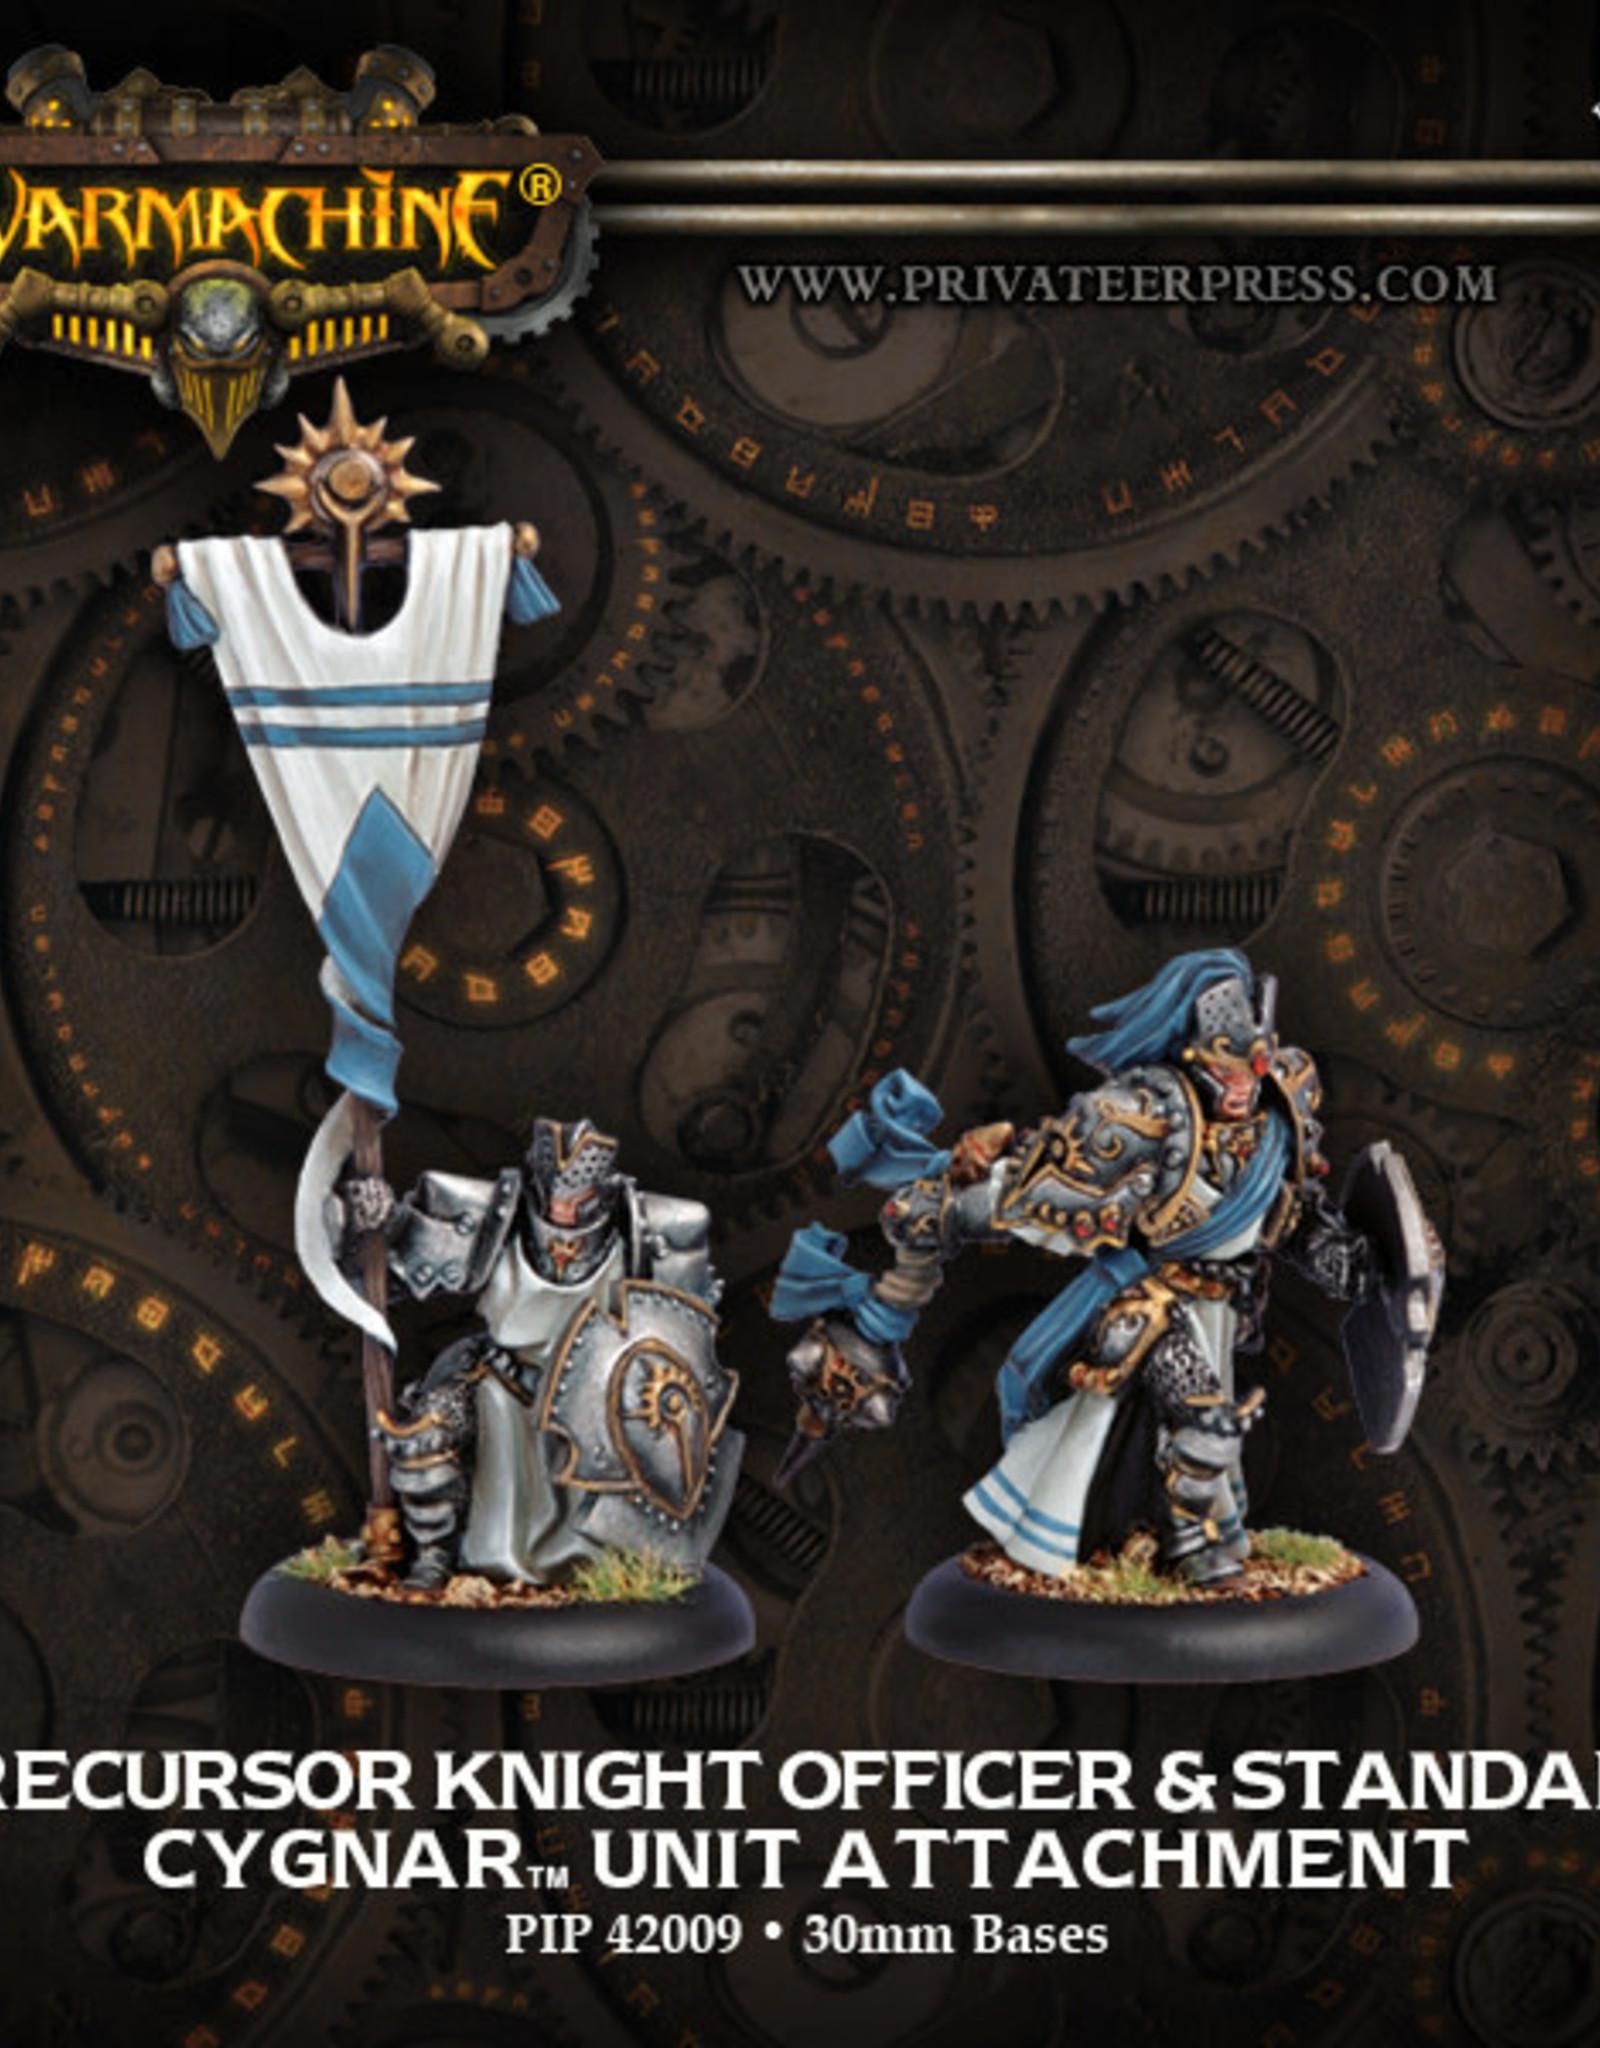 Warmachine Cygnar - Chaplain & Standard